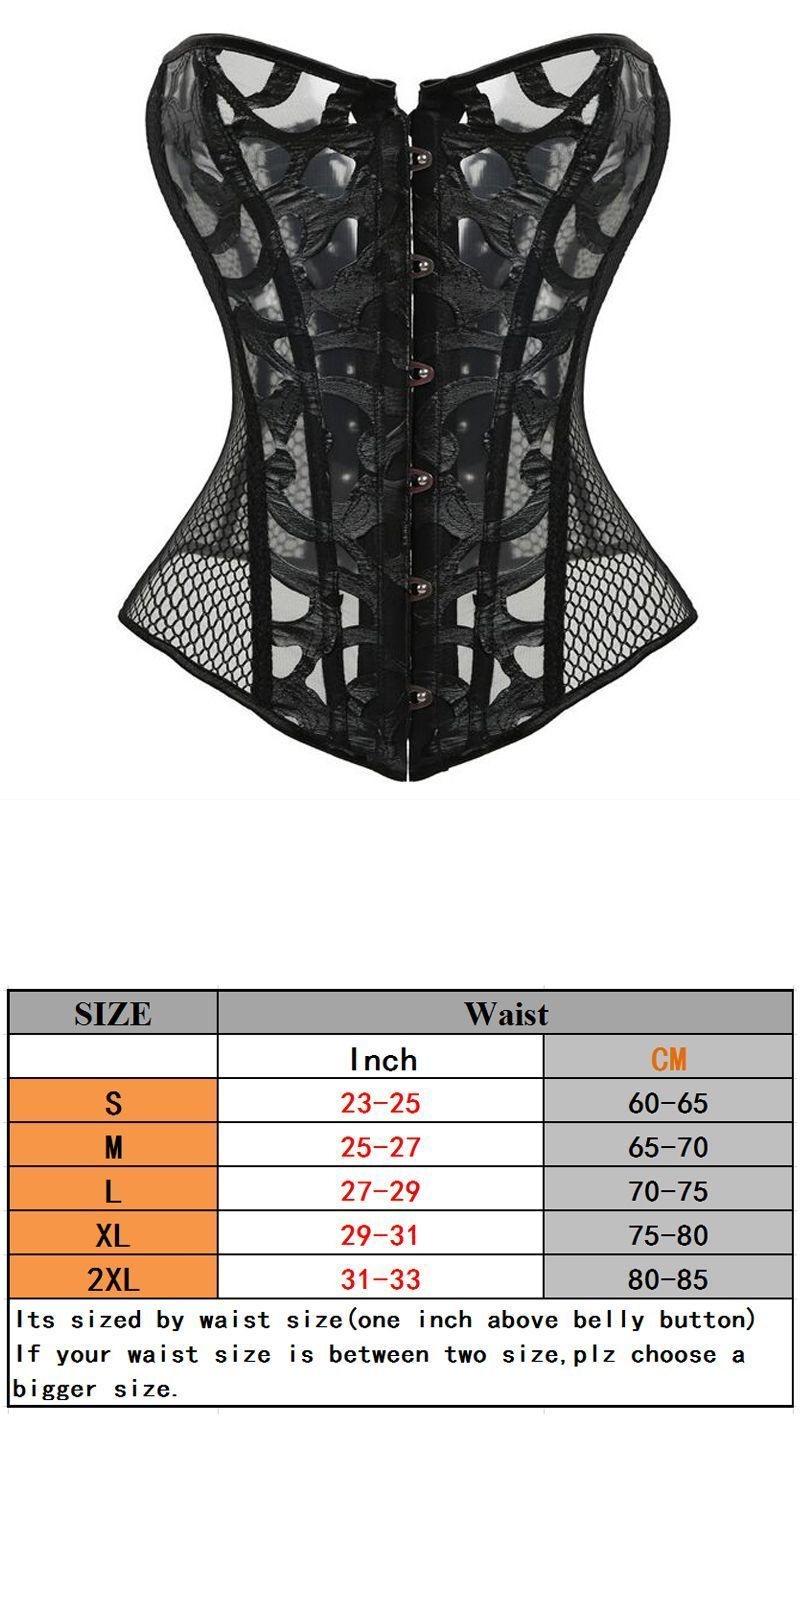 15b43b1cb324c Newest hot mesh corset boned black bustier top women summer slimming overbust  sexy transparent see trough waist trainer corset  women  bustiers      corsets ...